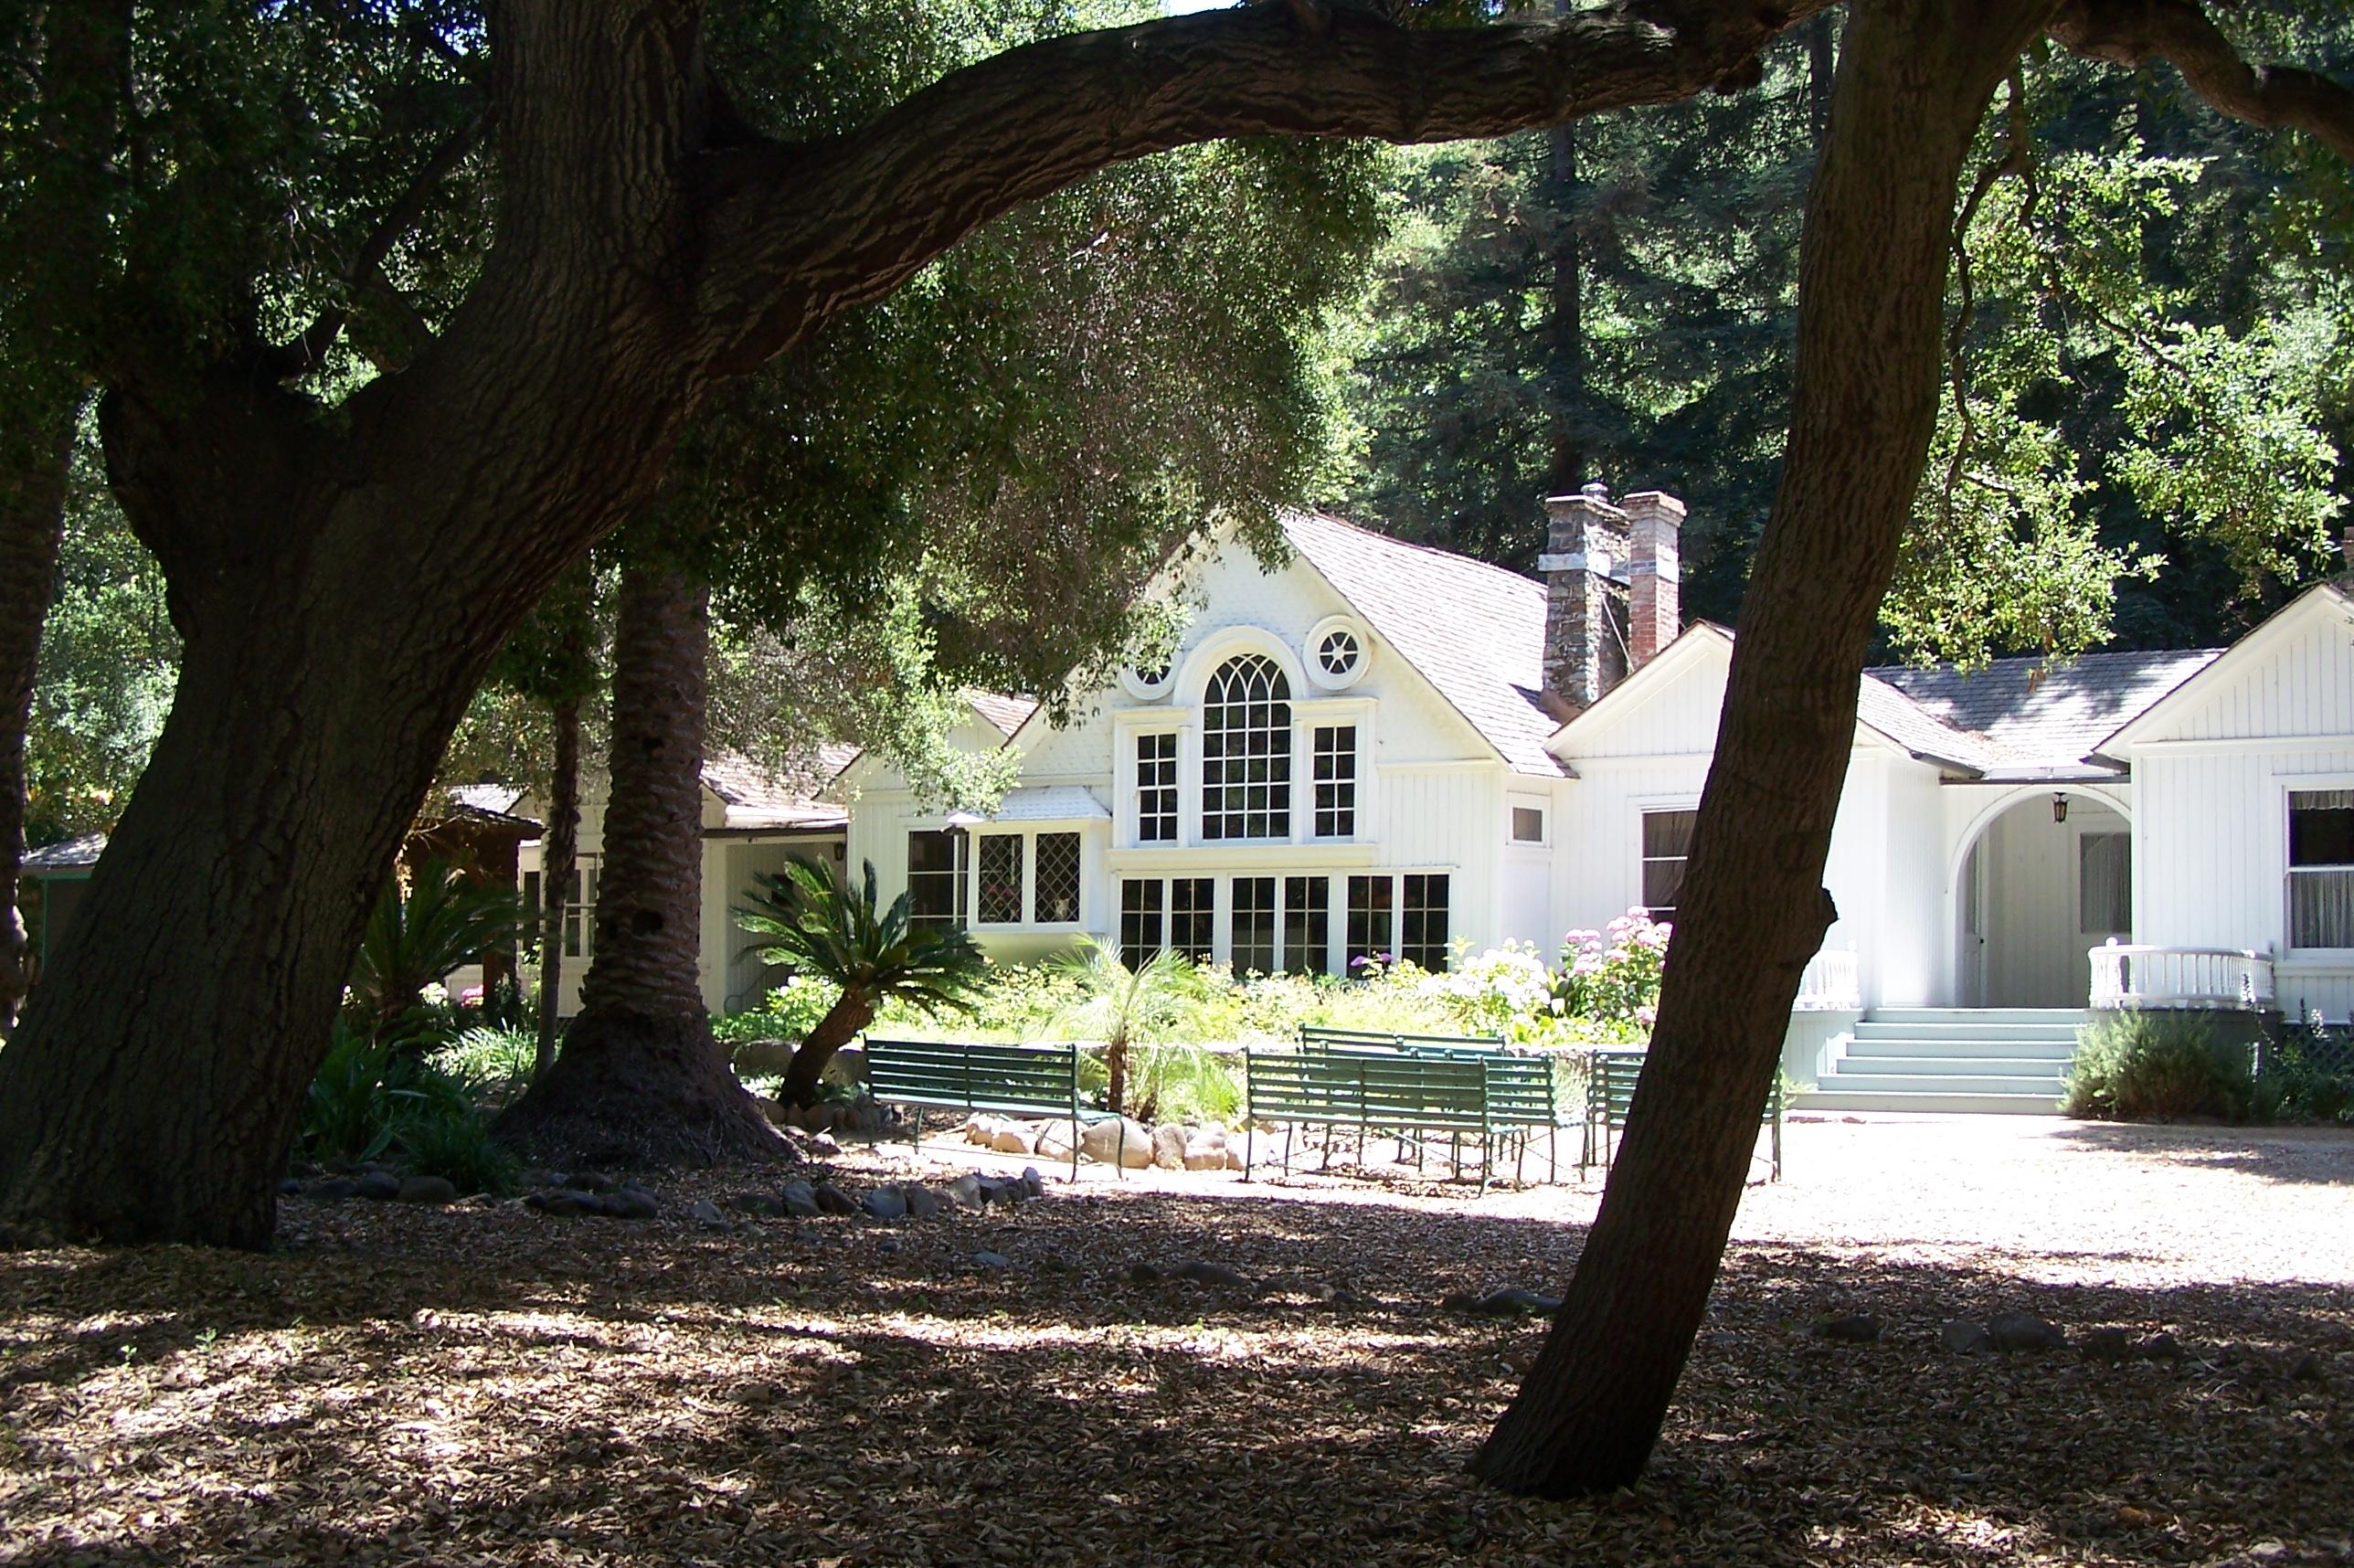 The Arden house seen through the resident oak trees.